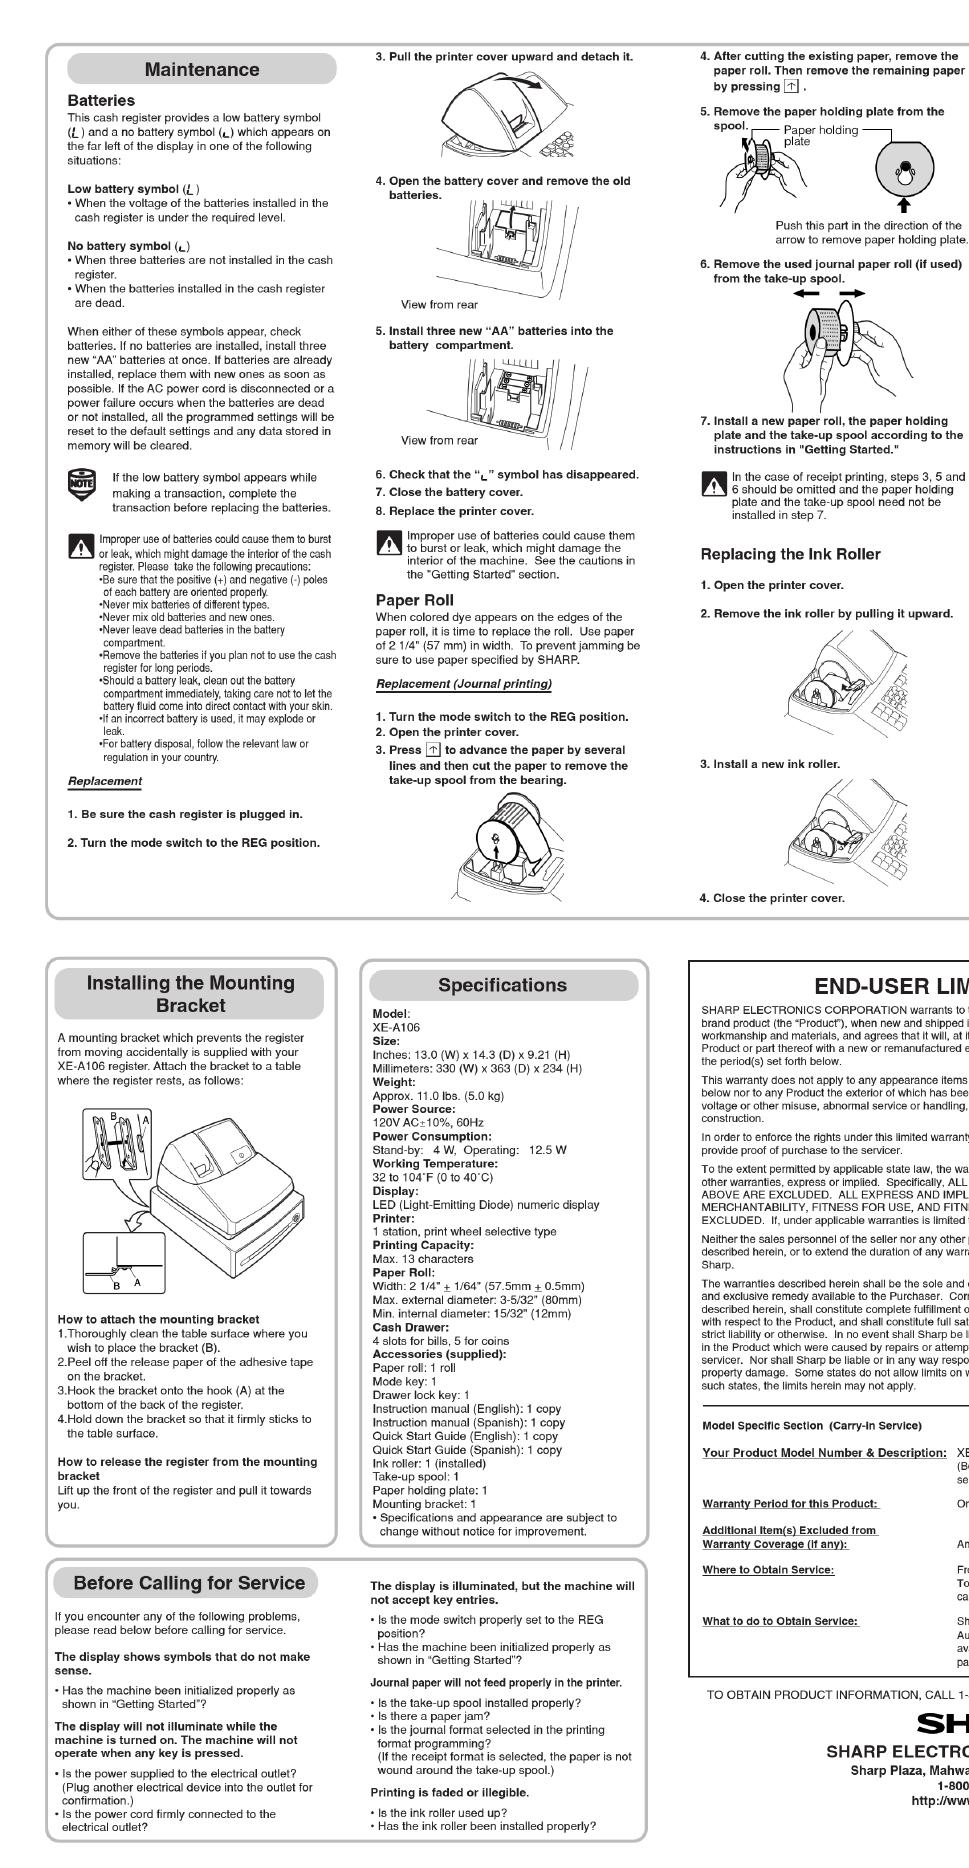 sharp xe a106 instruction manual free pdf download 2 pages rh manualagent com sharp xea106 manual sharp xe-a106 manual pdf